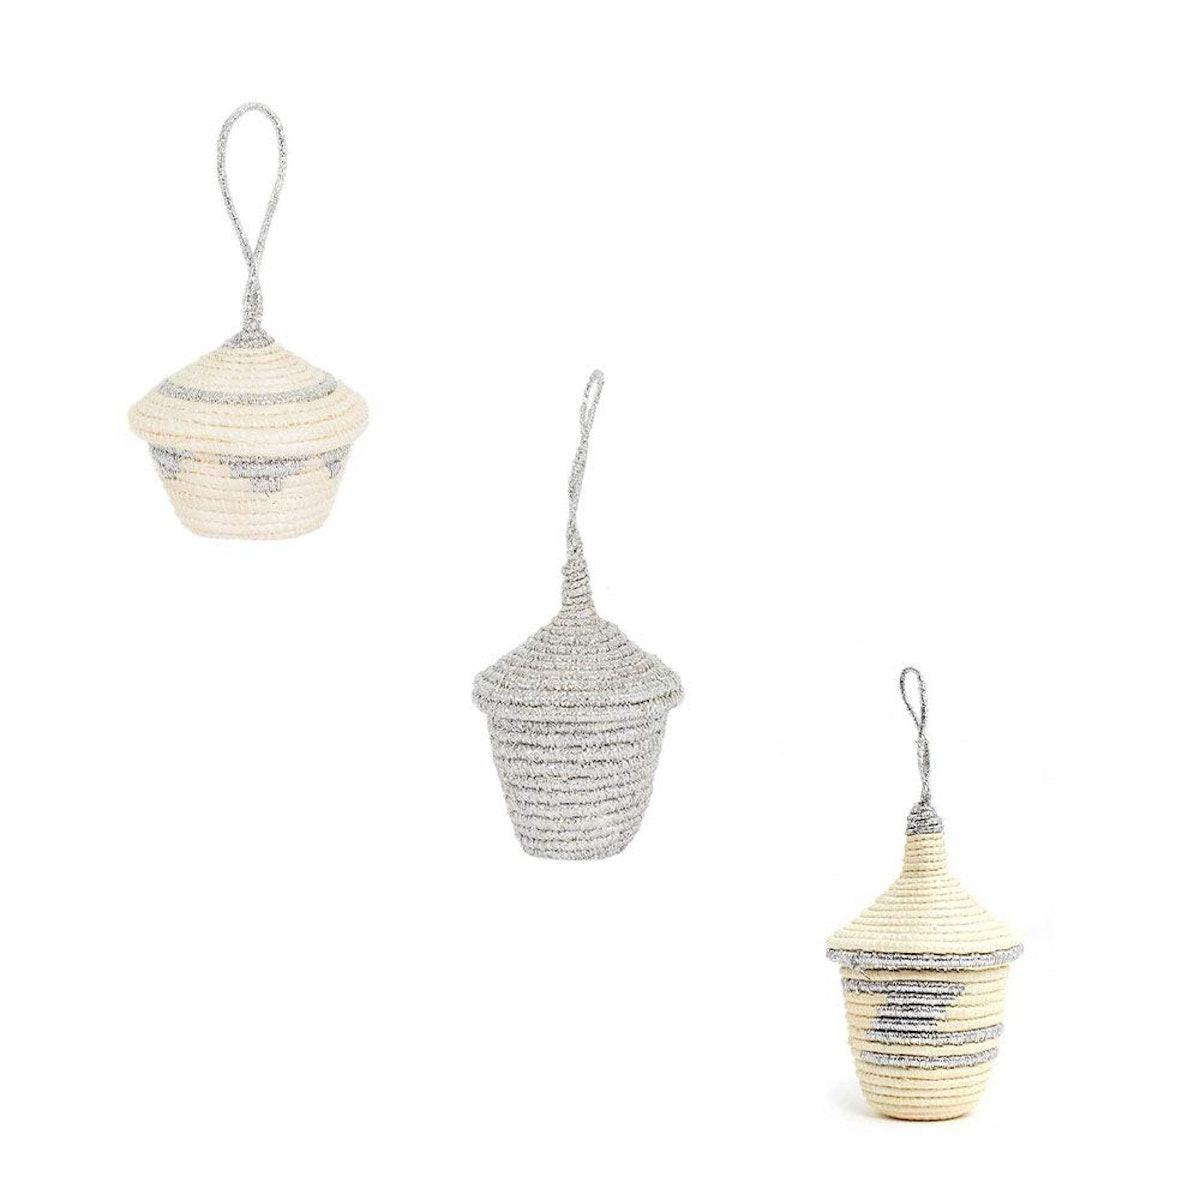 Mini Lidded Ornament Baskets - White & Silver Set Three